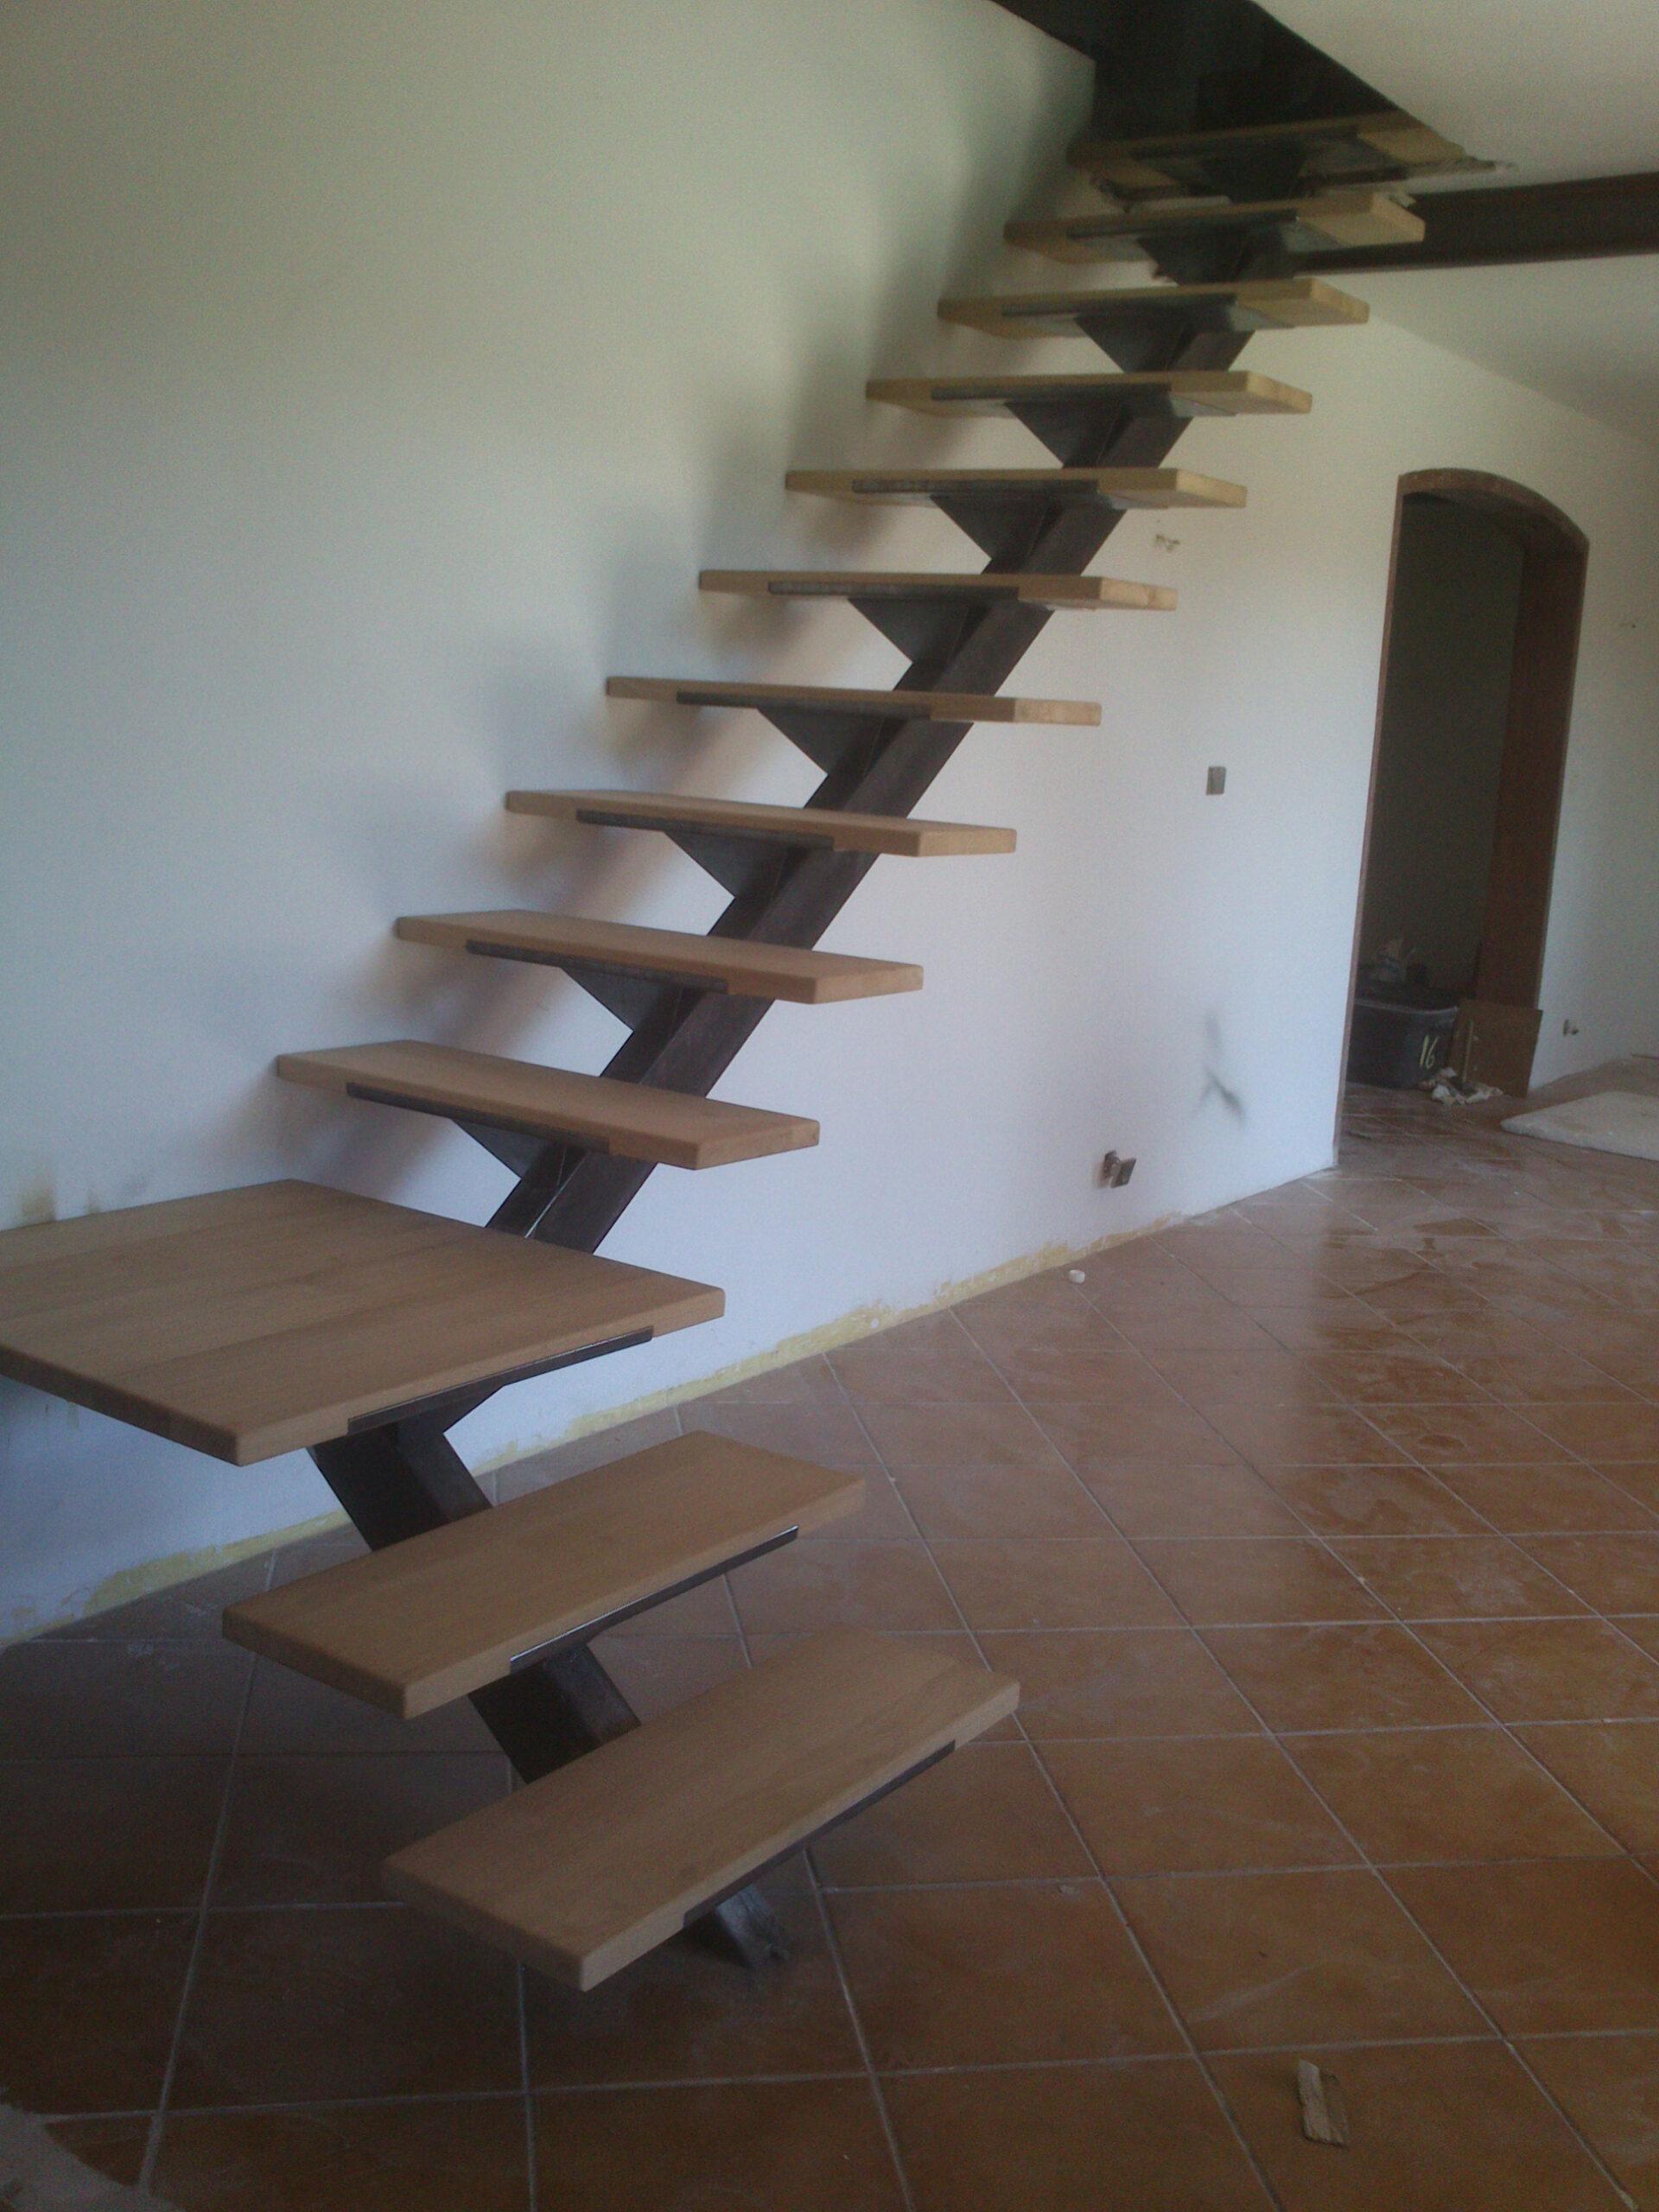 https://www.mon-artisan-ferronnier.com/wp-content/uploads/2021/04/escalier3-scaled.jpeg